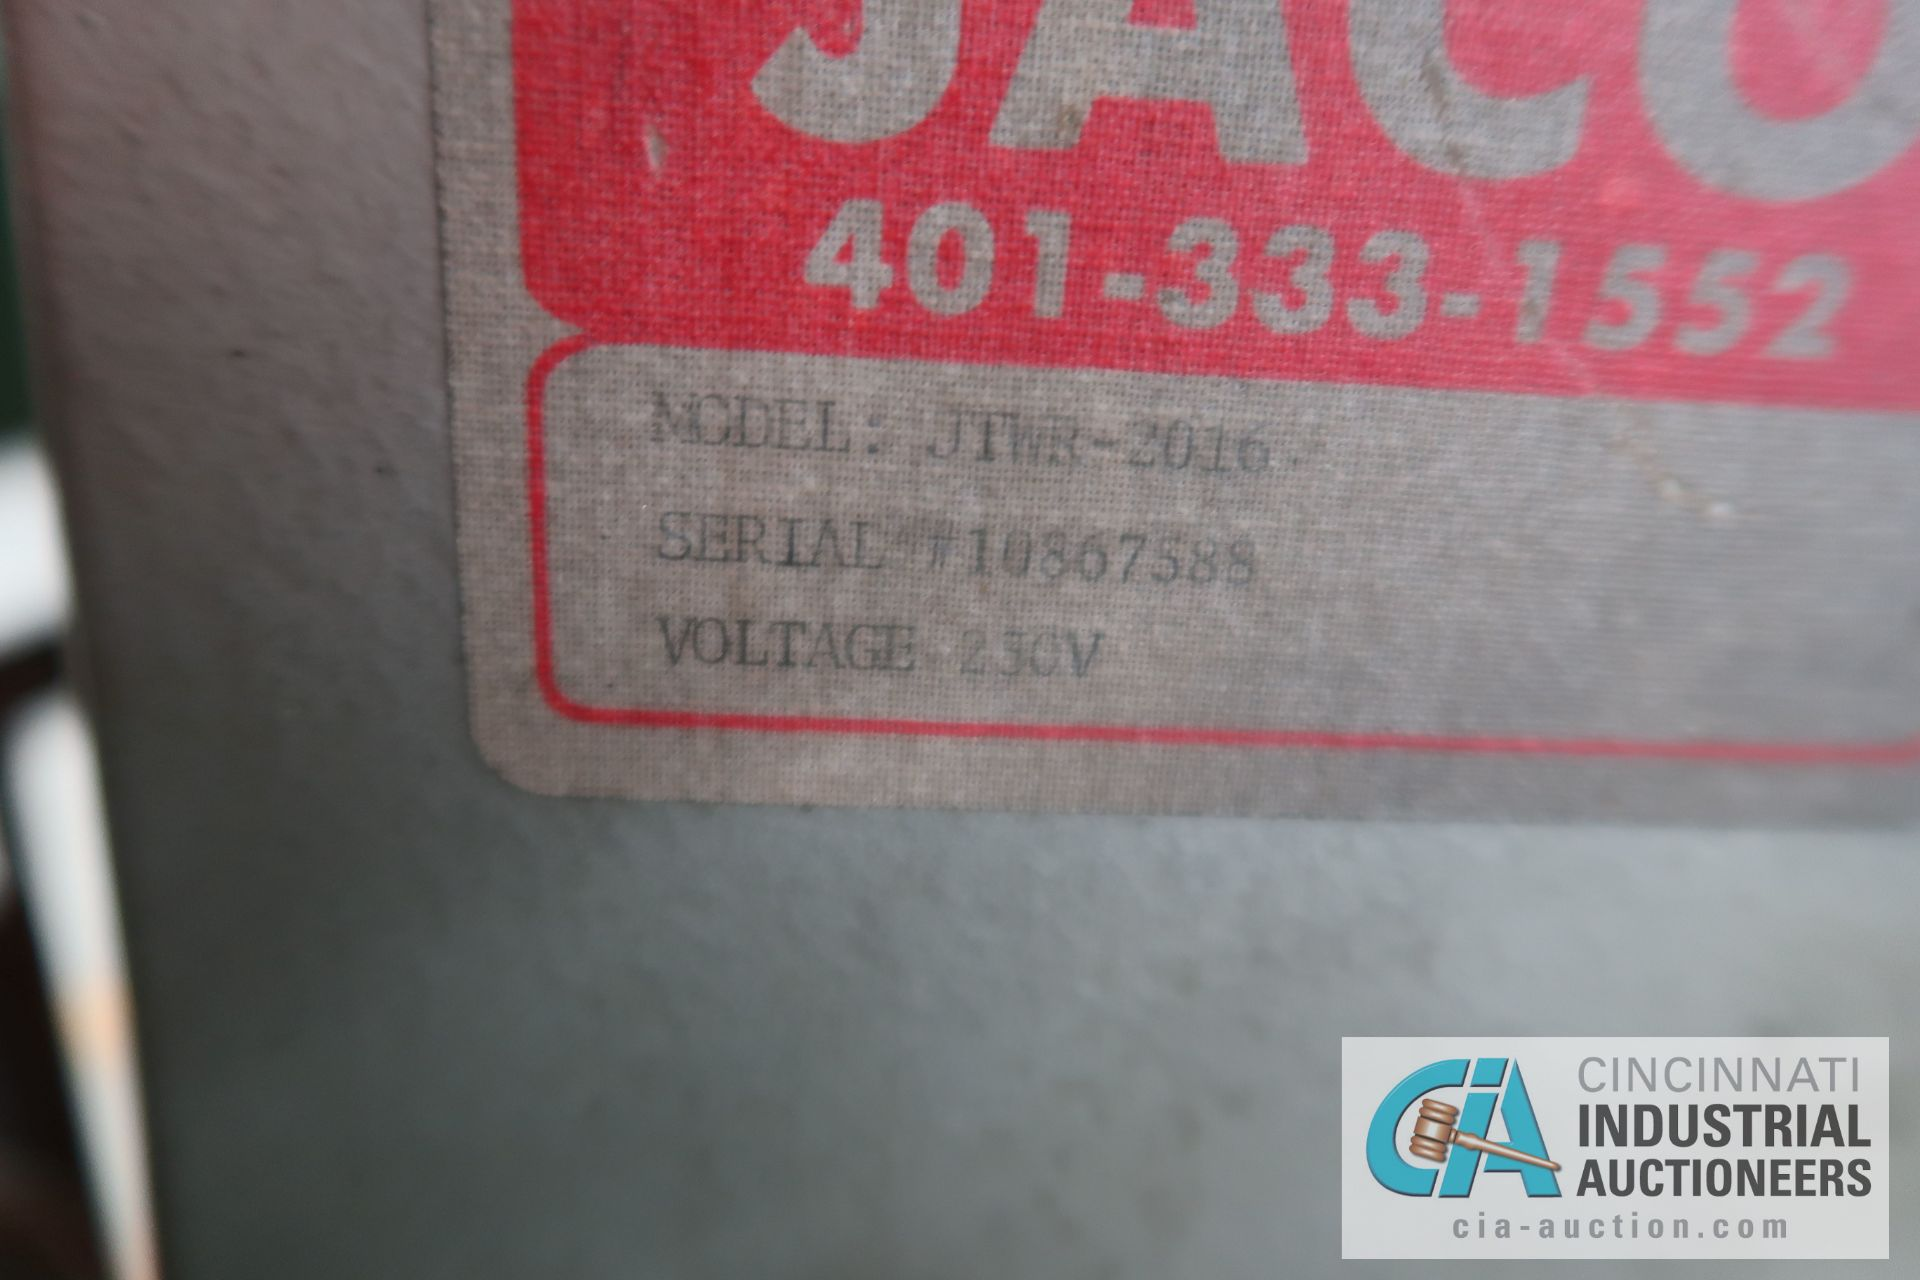 2,000 LB. CAPACITY JACO MODEL JTWR-2016 COIL REEL; S/N 10867588 - Image 5 of 5